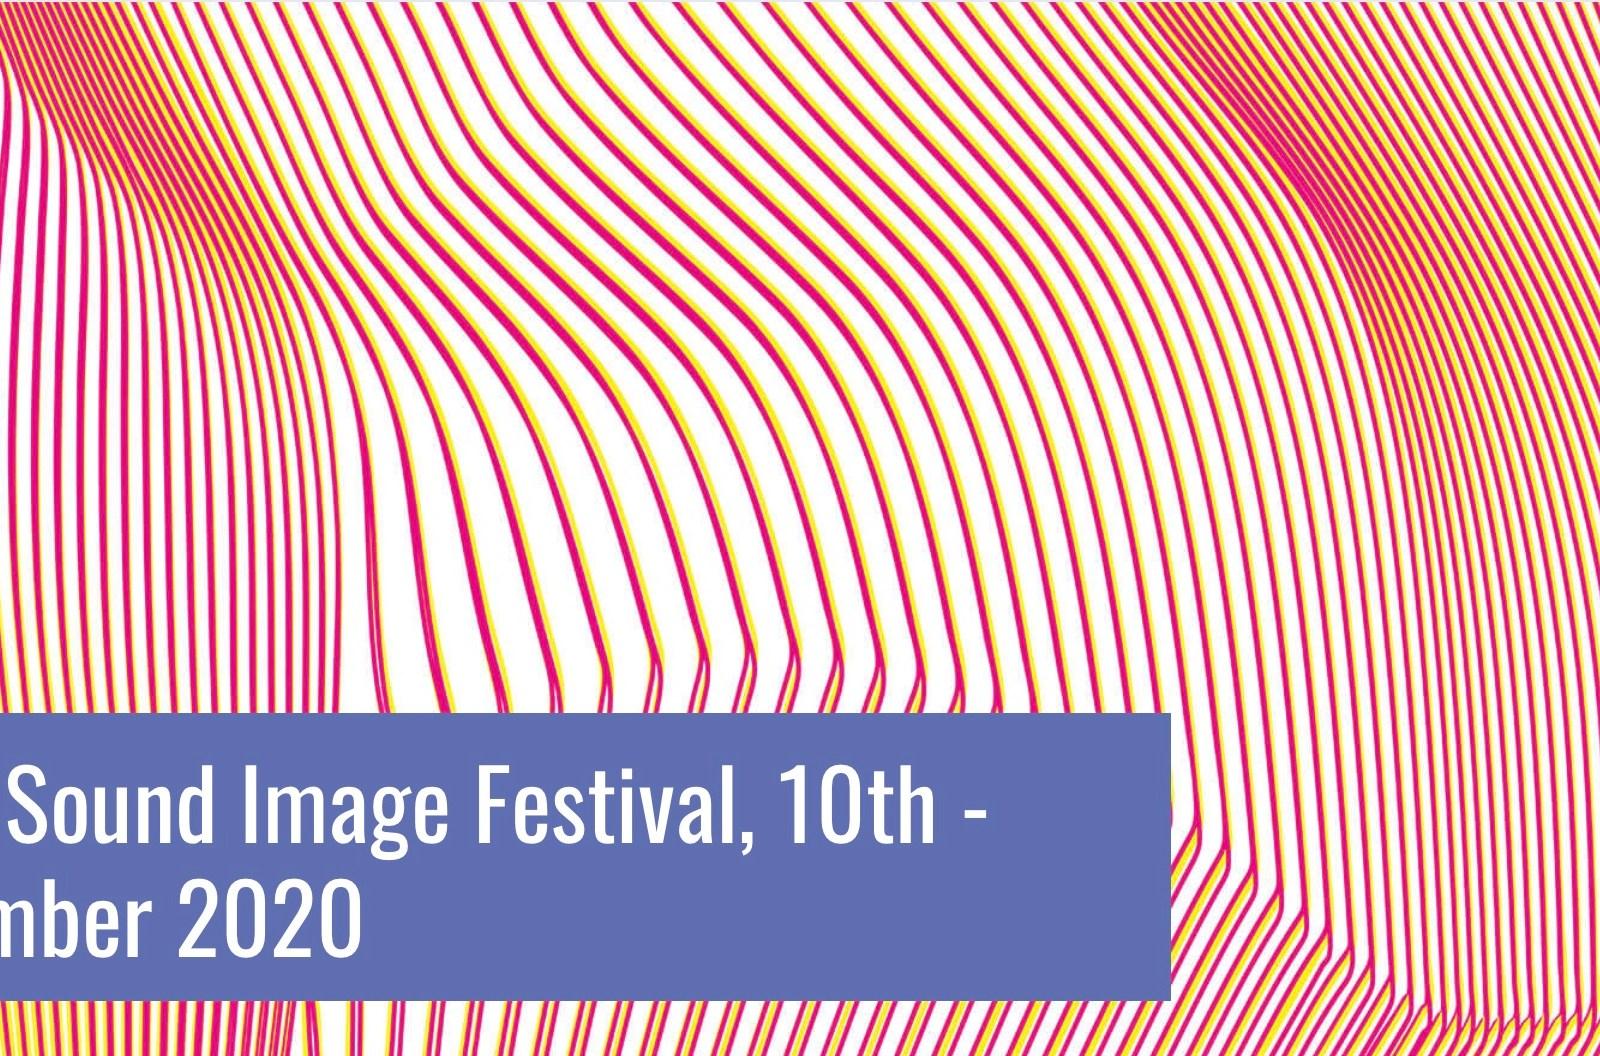 Sound Image Festival logo grab